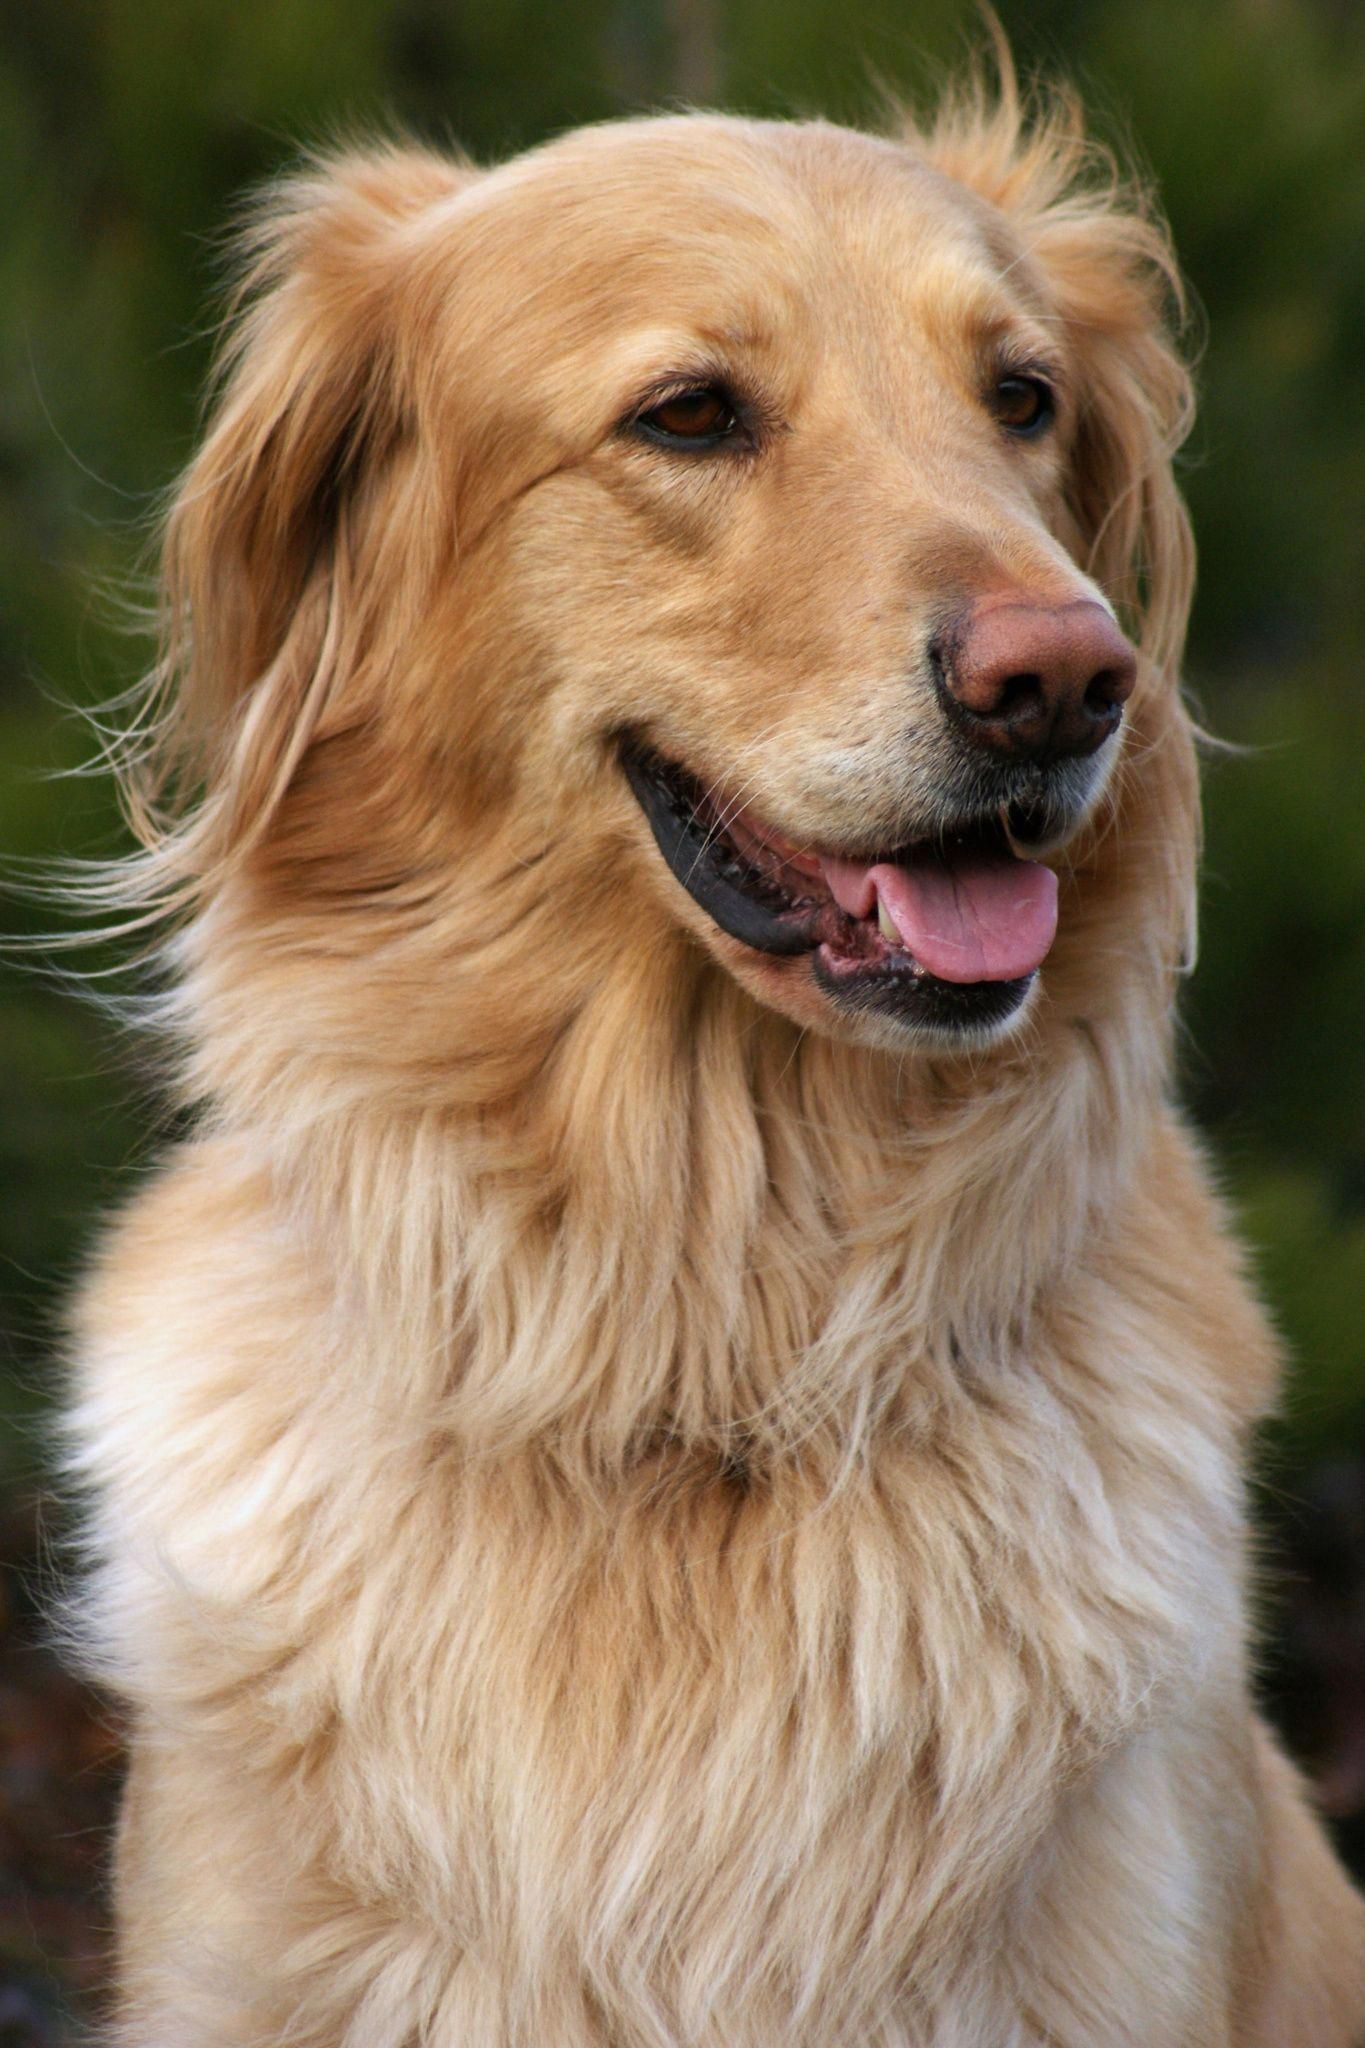 Train Your Pet Dogtraininglondon 1215678936 Dogtrickstrainingteaching Dog Training Dog Potty Training Dogs